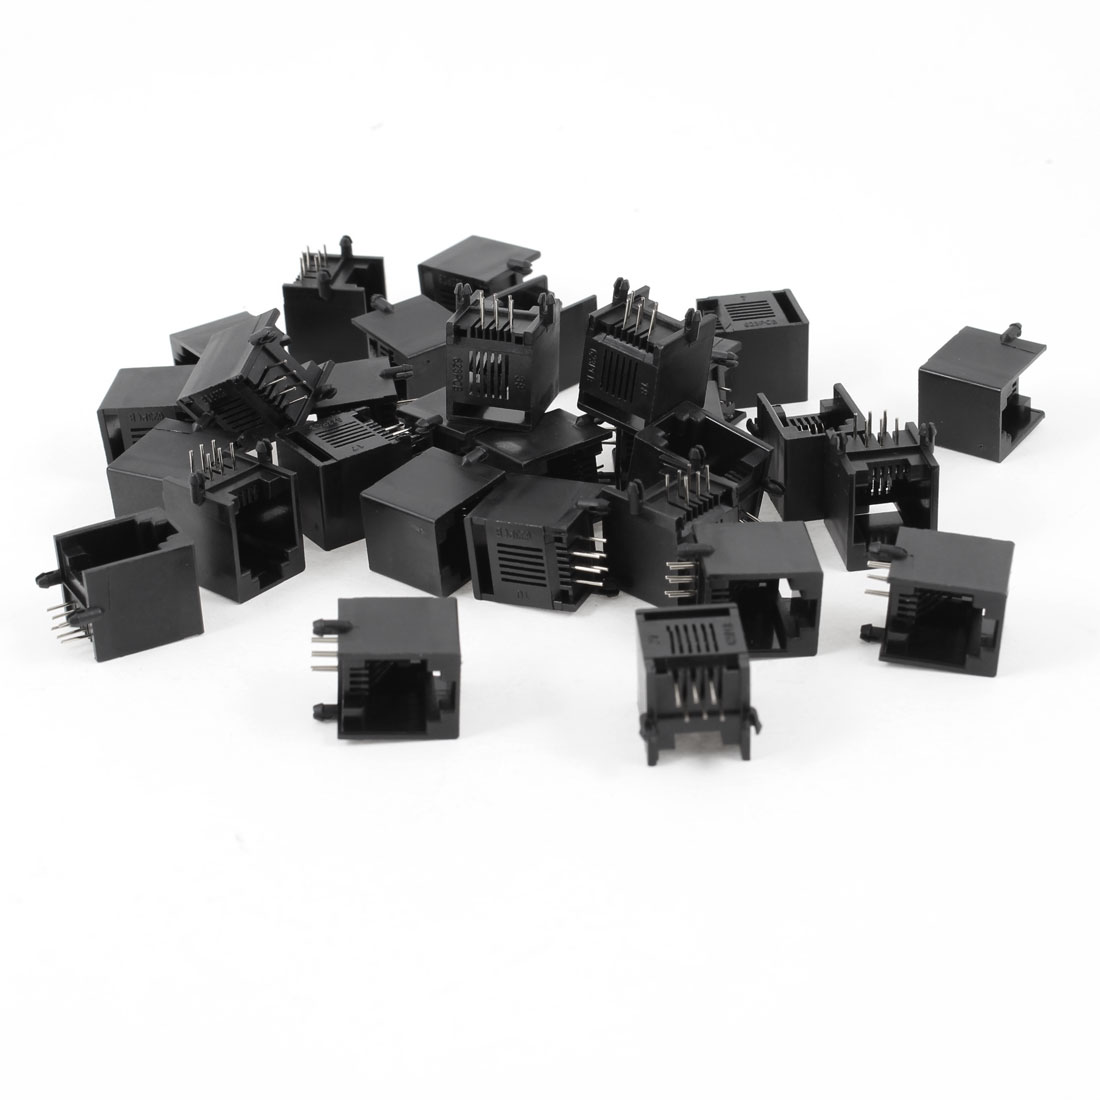 30 Pcs Black Plastic Unshielded RJ12 6P6C Network Modular PCB Connector Jacks